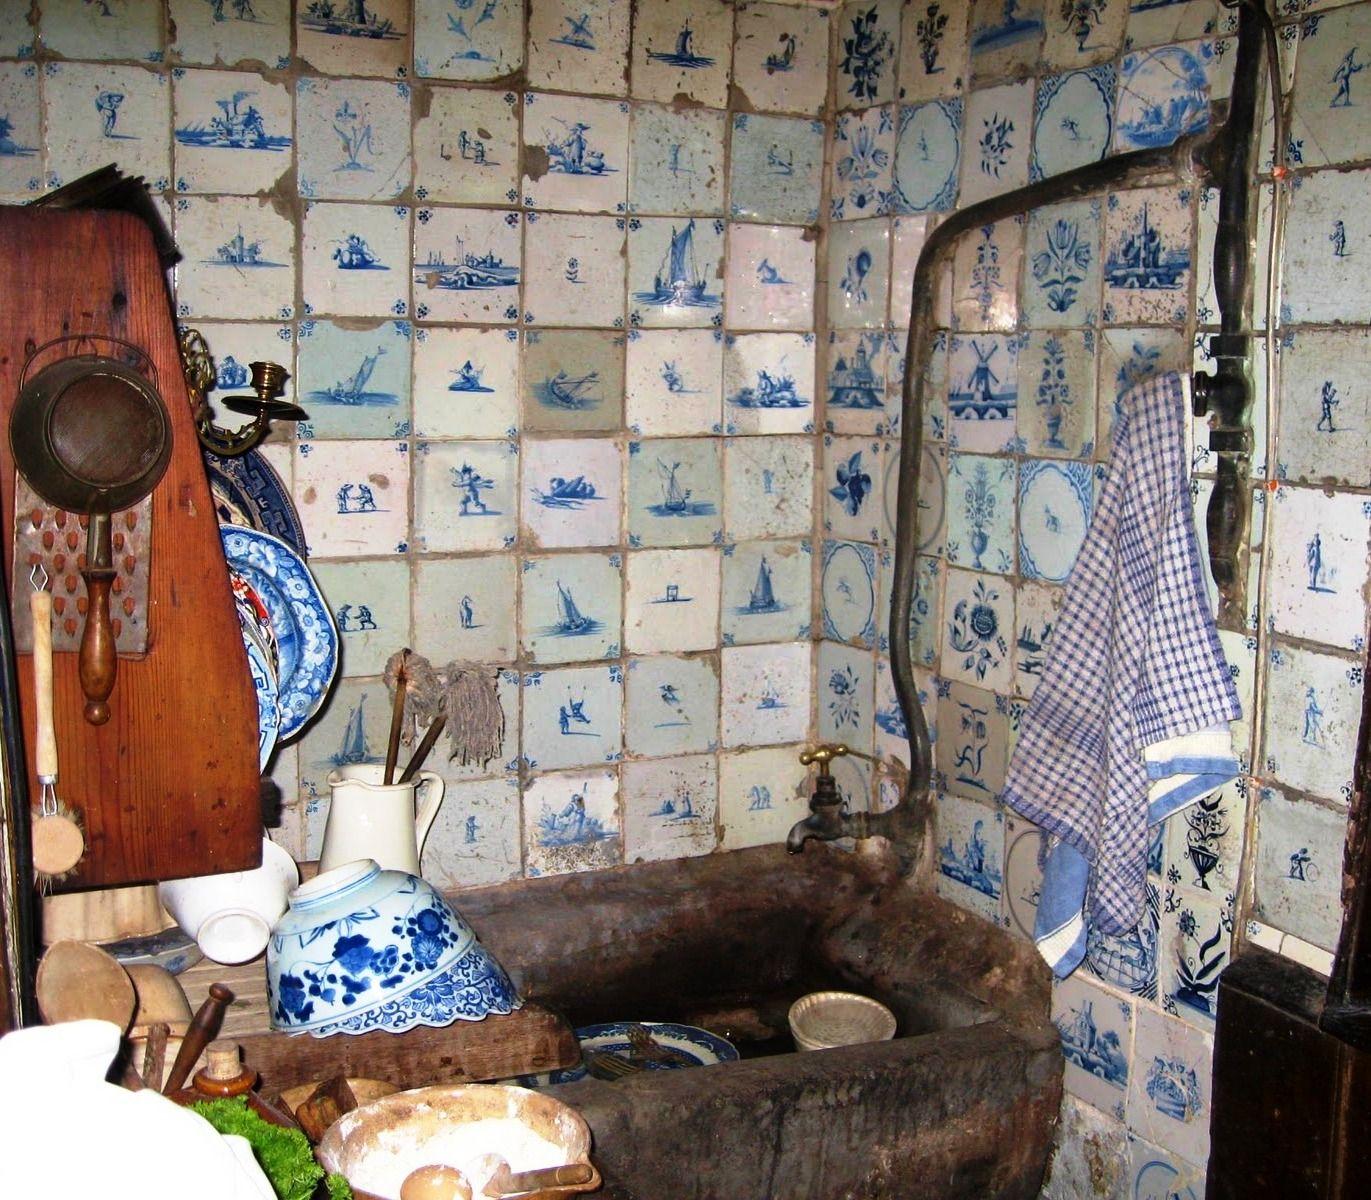 stone kitchen sink Stone Kitchen sink and old Delft tiles Dennis Severs House 18 Folgate st Spitalfields London